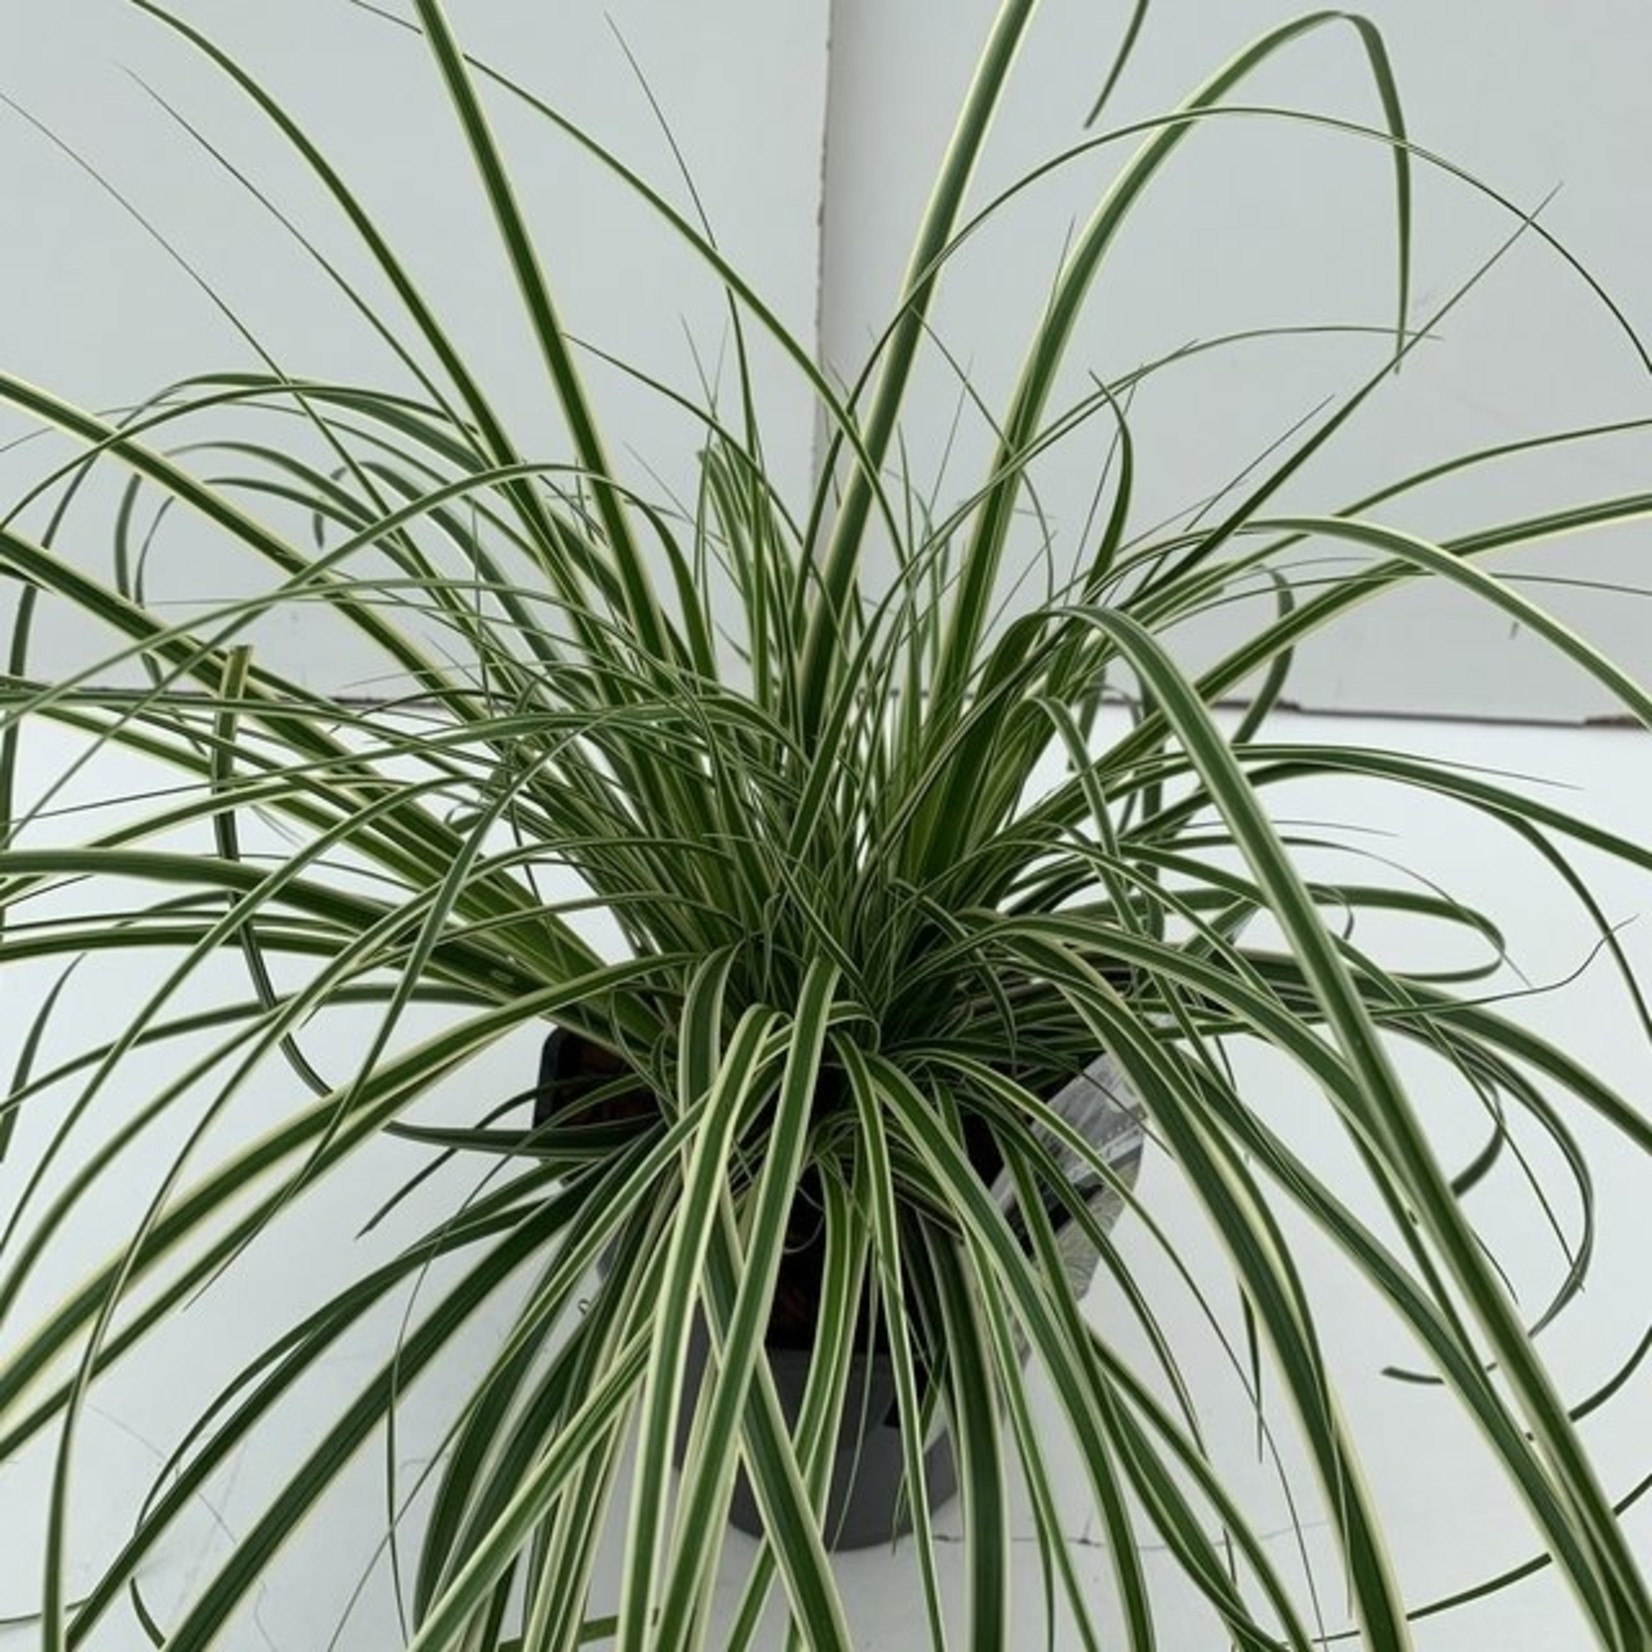 Decor Ornamental Grasses vp2L Carex oshimensis 'Evercream' (bontbladige zegge)